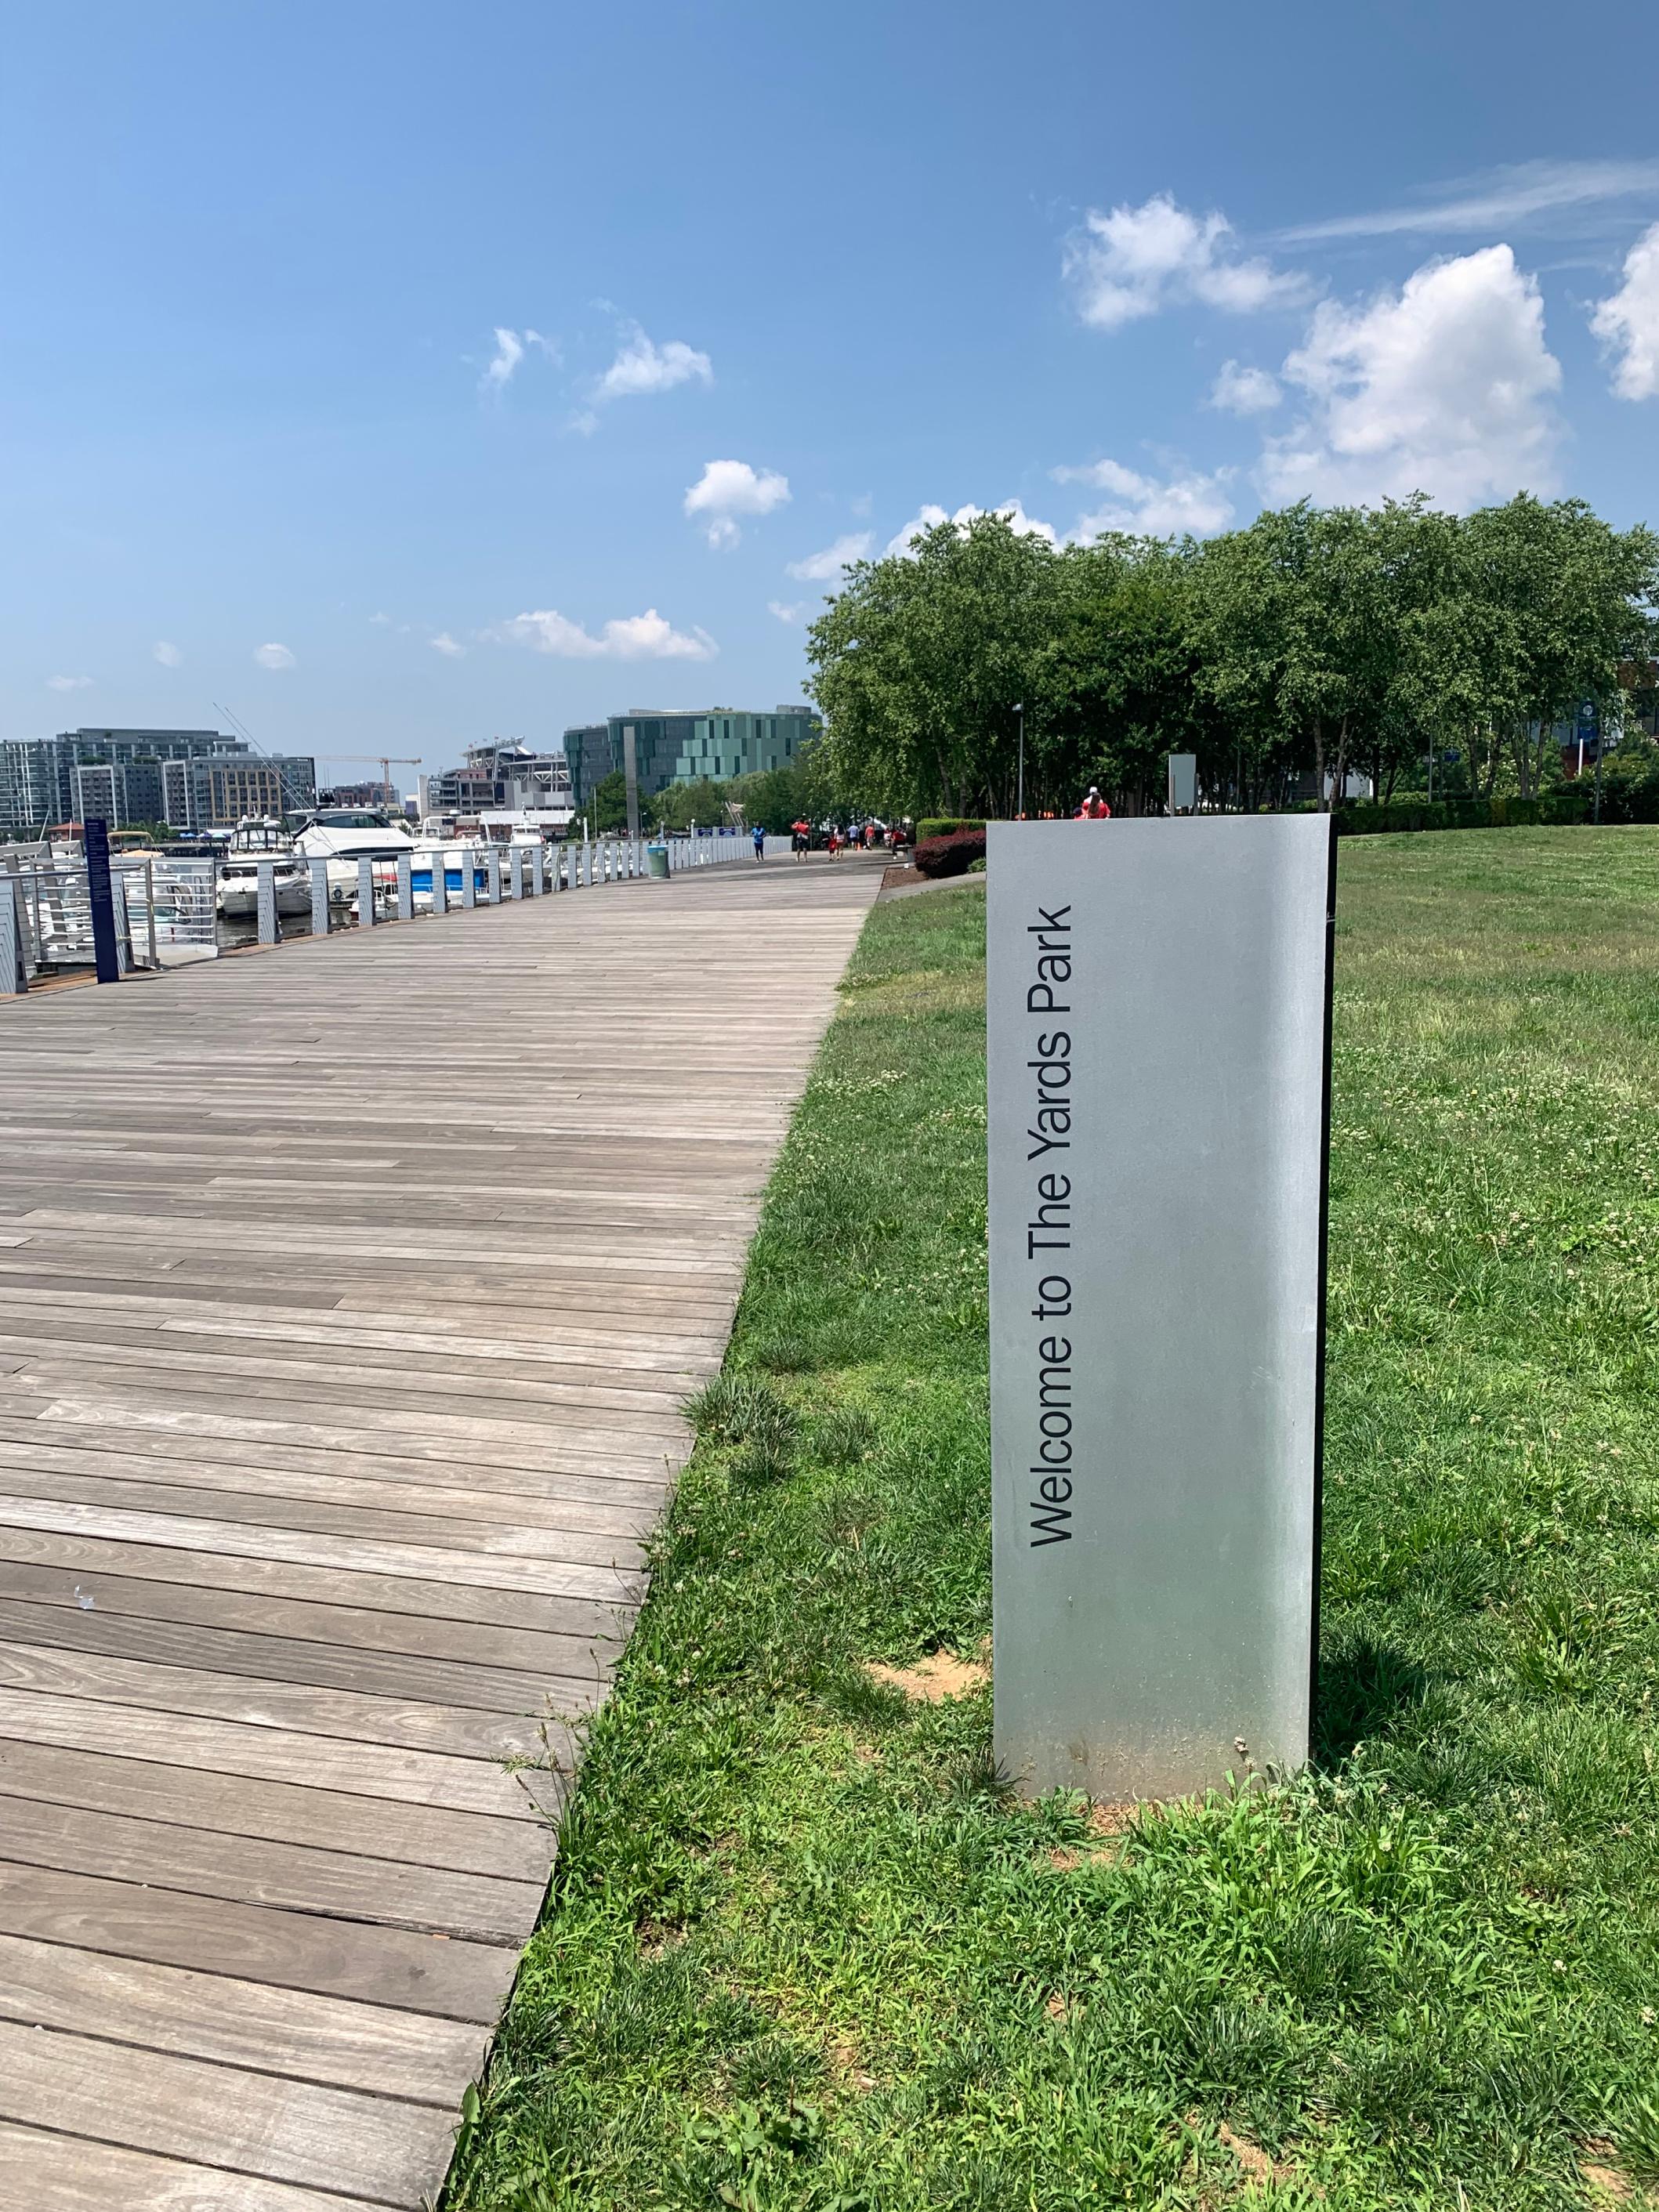 Anacostia Riverwalk Trail, DC